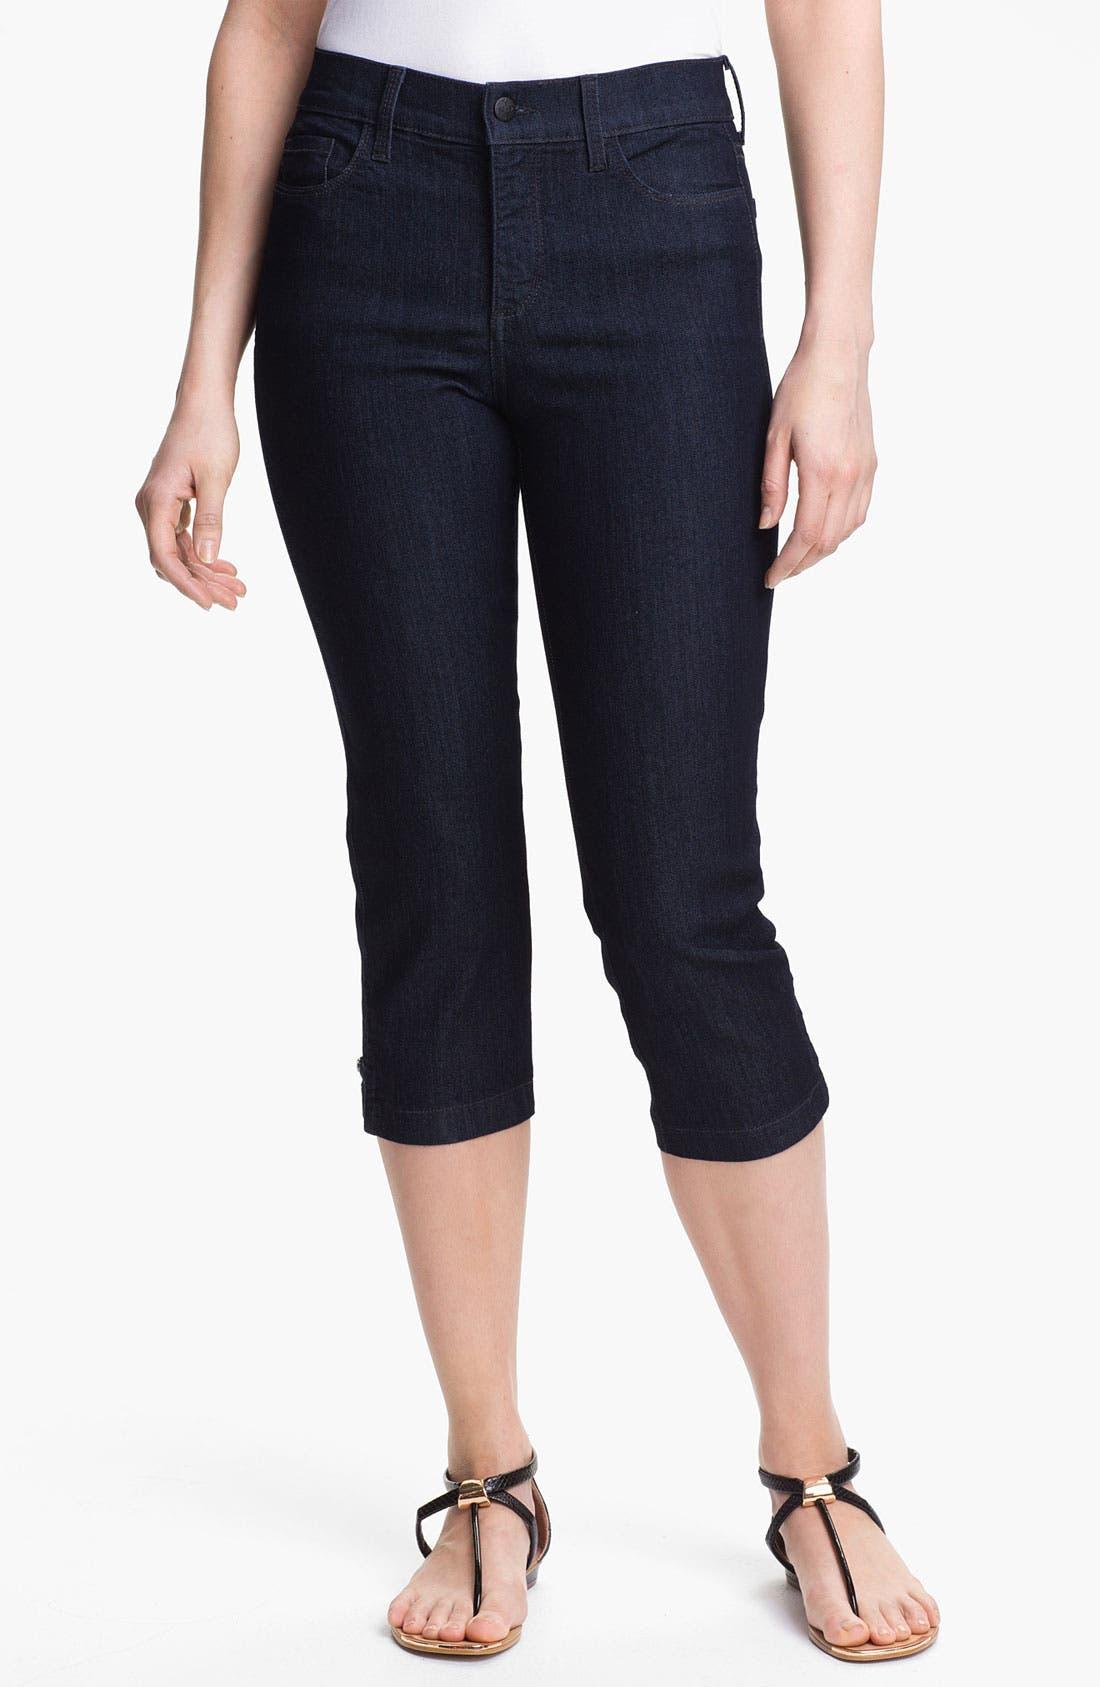 Alternate Image 1 Selected - NYDJ 'Winona' Crop Stretch Jeans